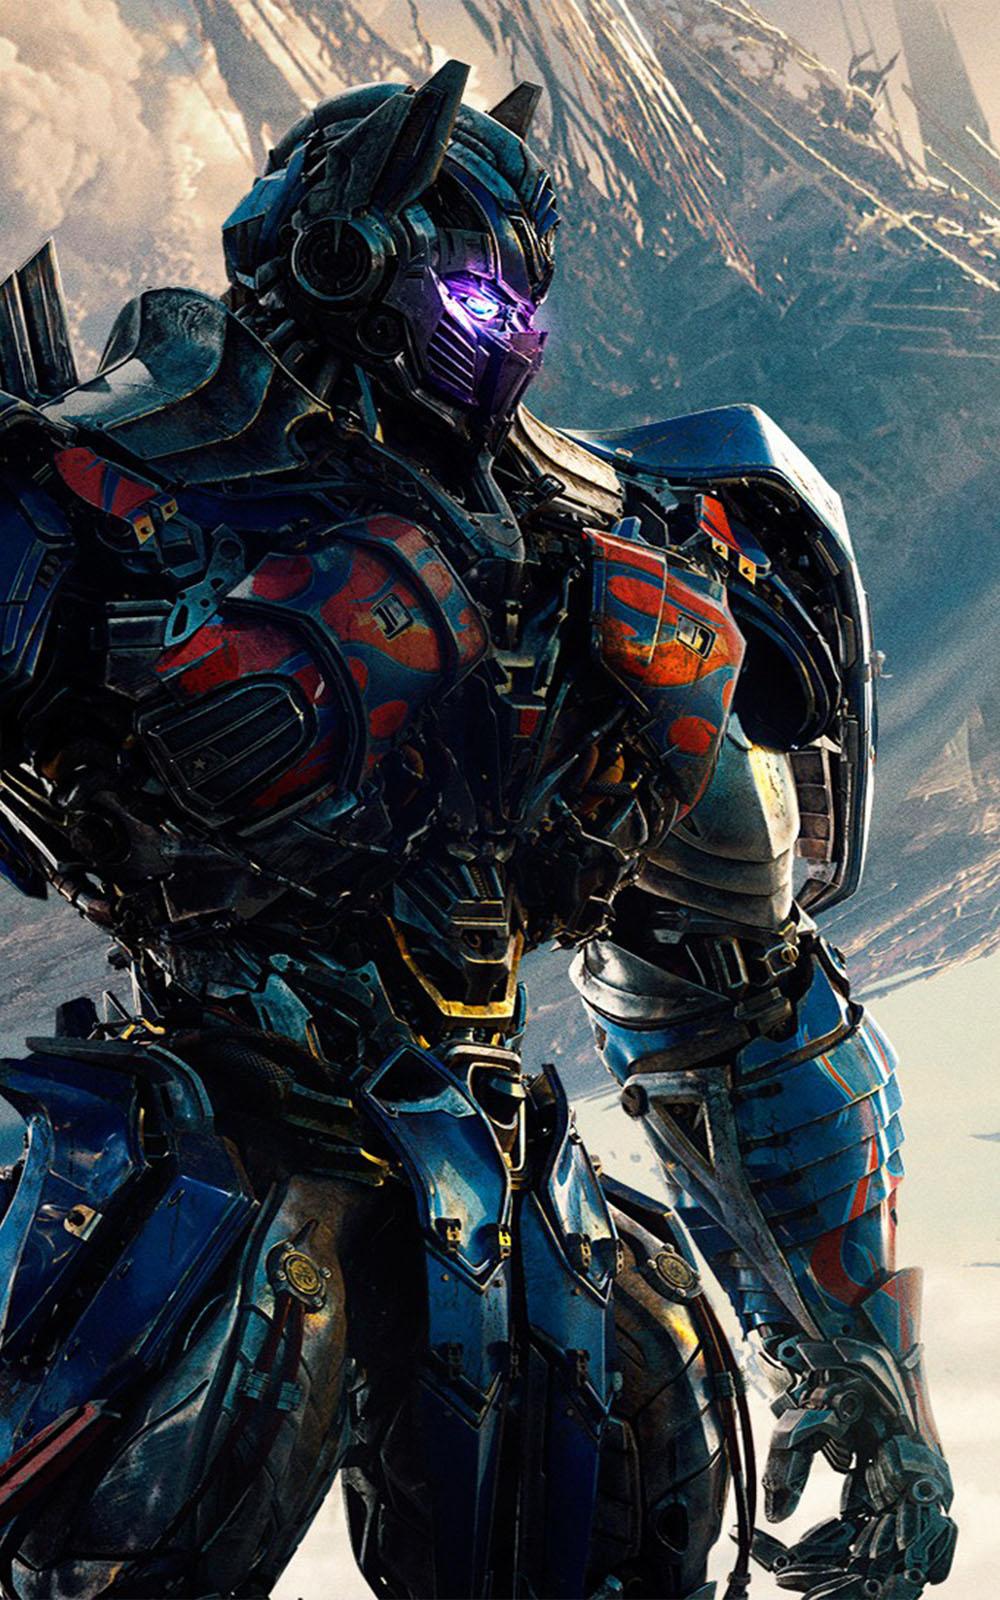 Download Wallpaper Transformers The Last Knight 72689 Hd